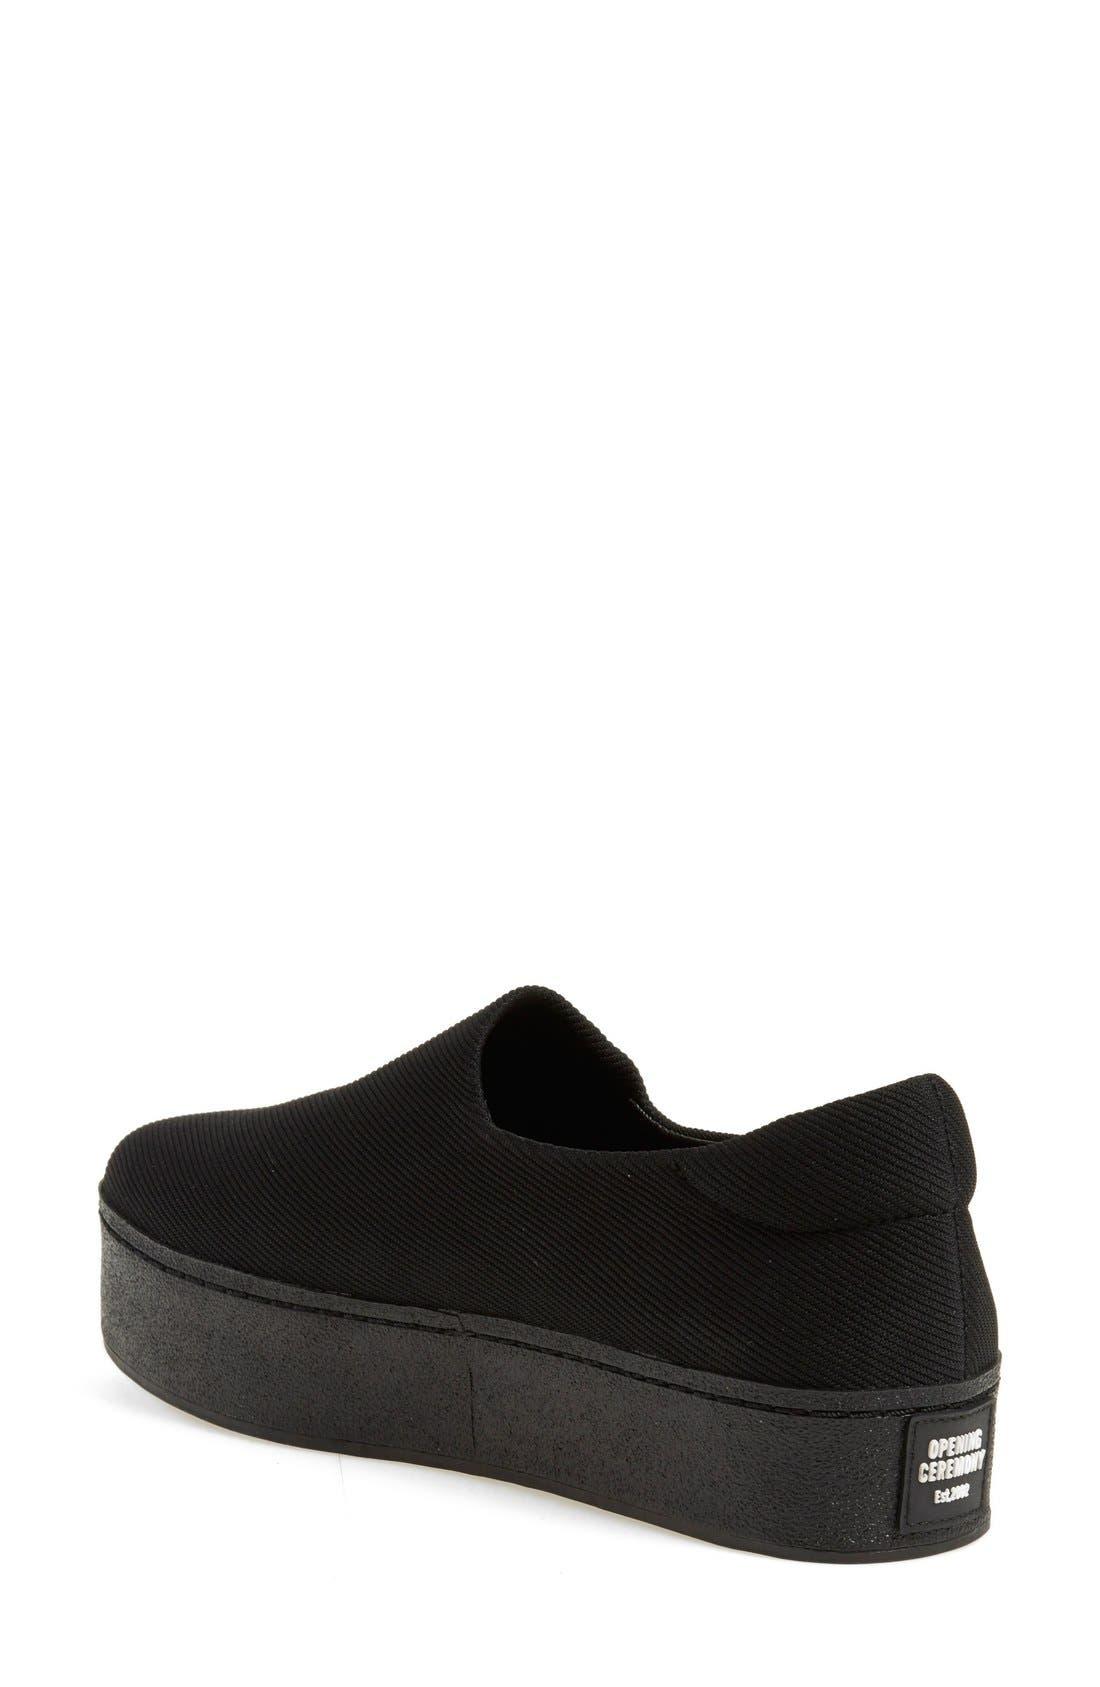 Cici Platform Sneaker,                             Alternate thumbnail 3, color,                             001